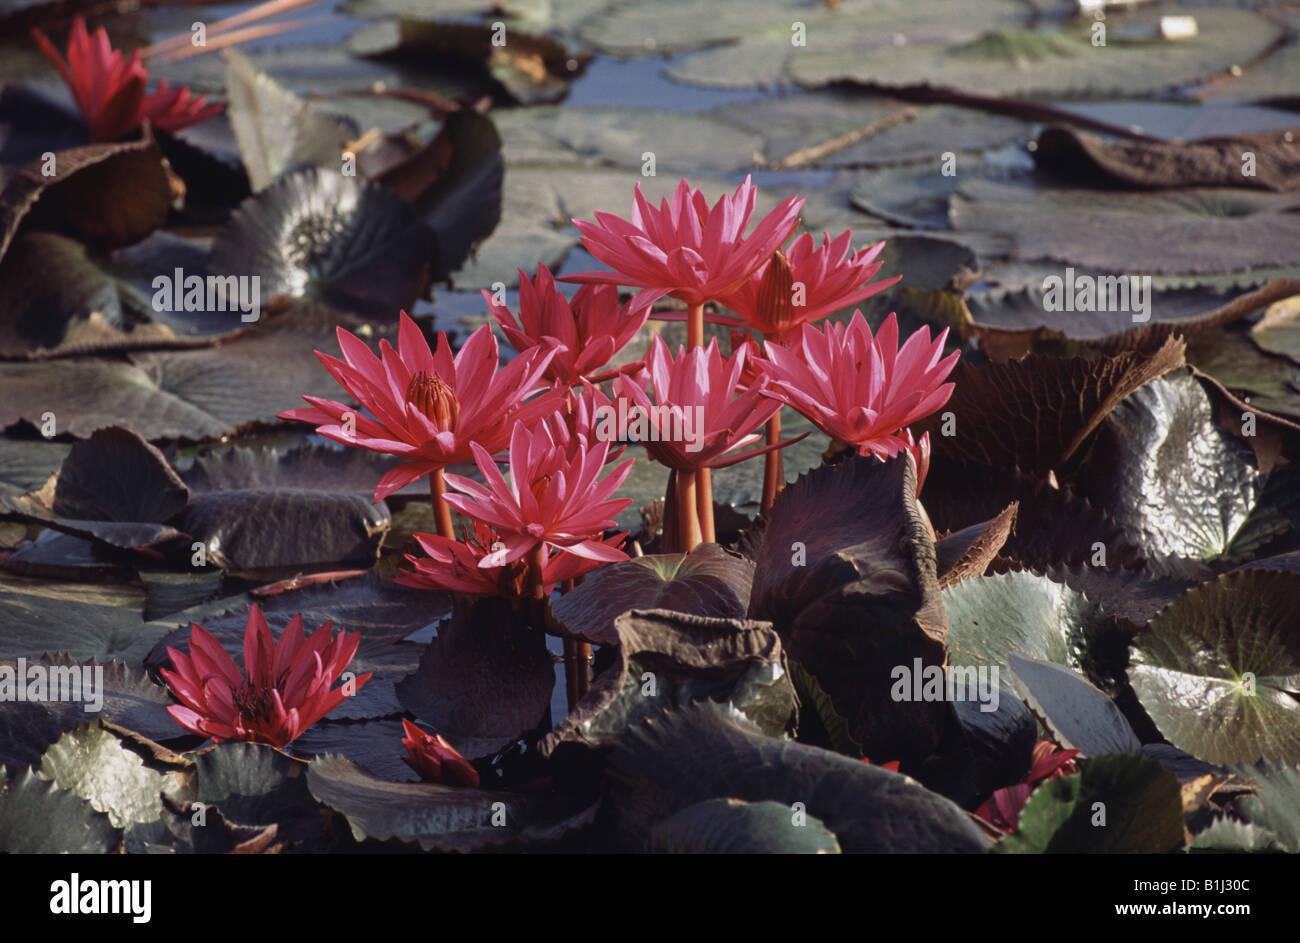 Water lilies in a pond tamil nadu india stock photo 18222524 alamy water lilies in a pond tamil nadu india izmirmasajfo